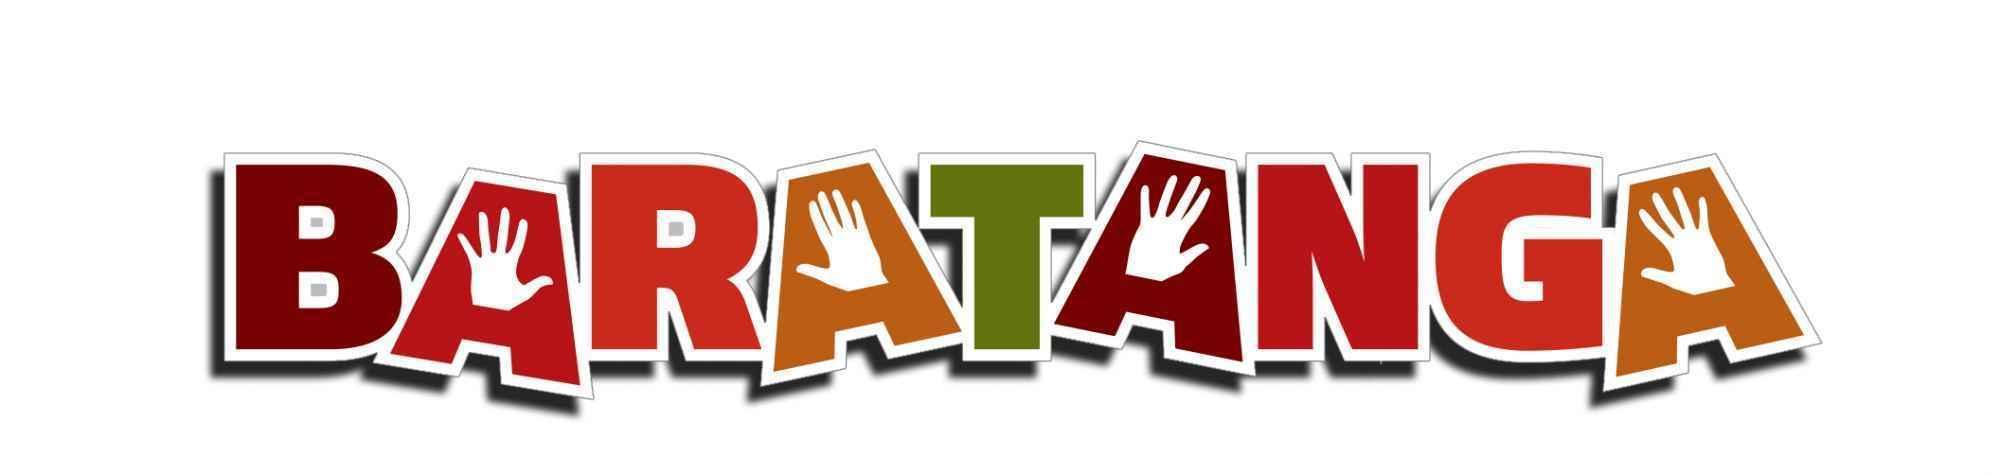 Logo Baratanga HORIZONTAL blanc